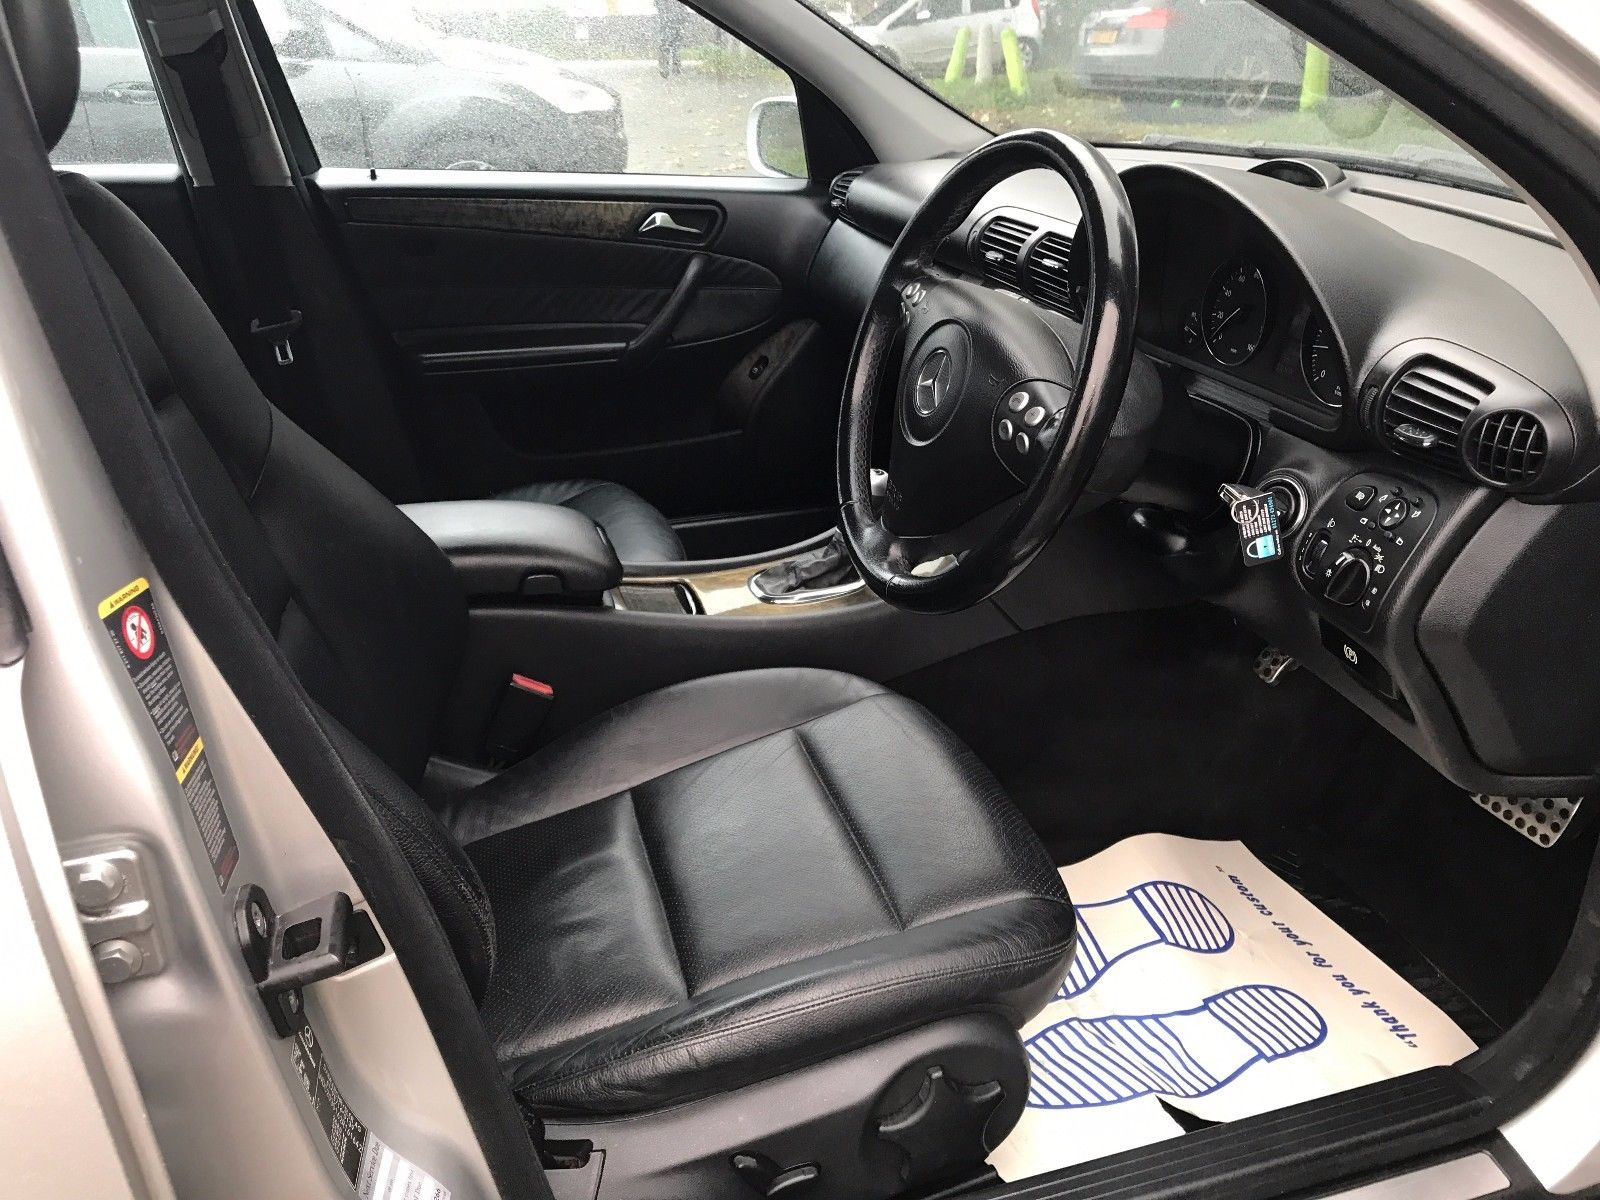 Mercedes Benz C270 Cdi Avantgarde M Cars